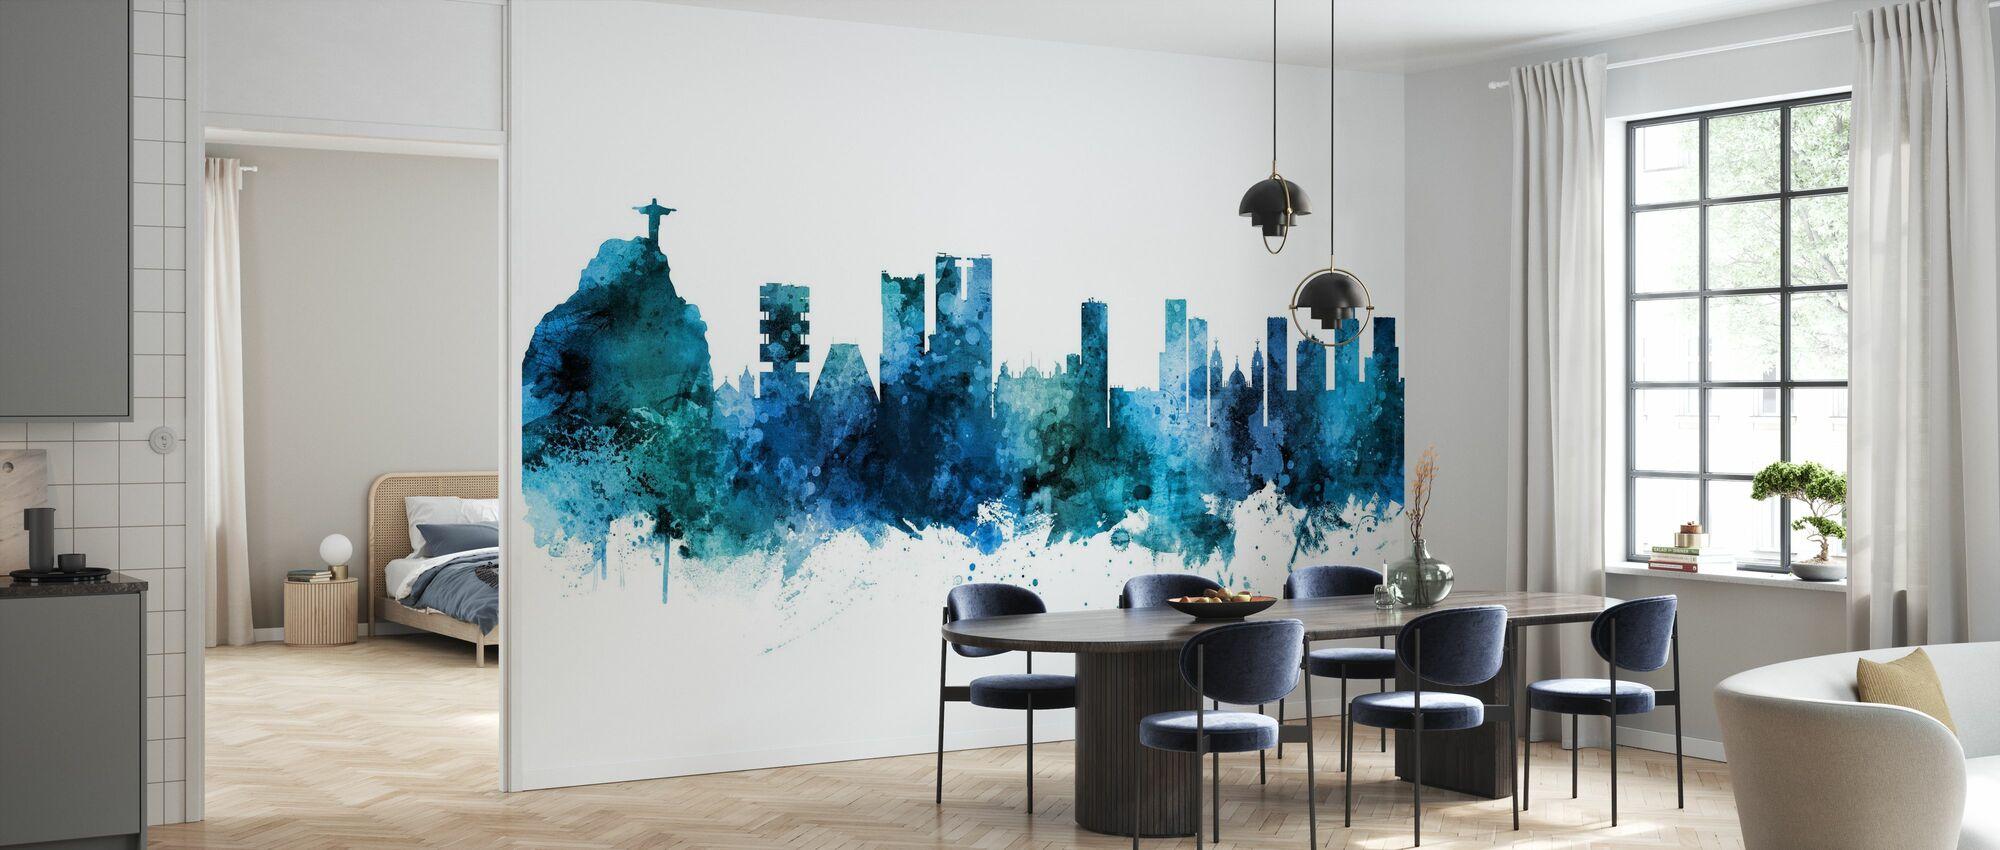 Rio de Janeiro Skyline Brazil - Wallpaper - Kitchen